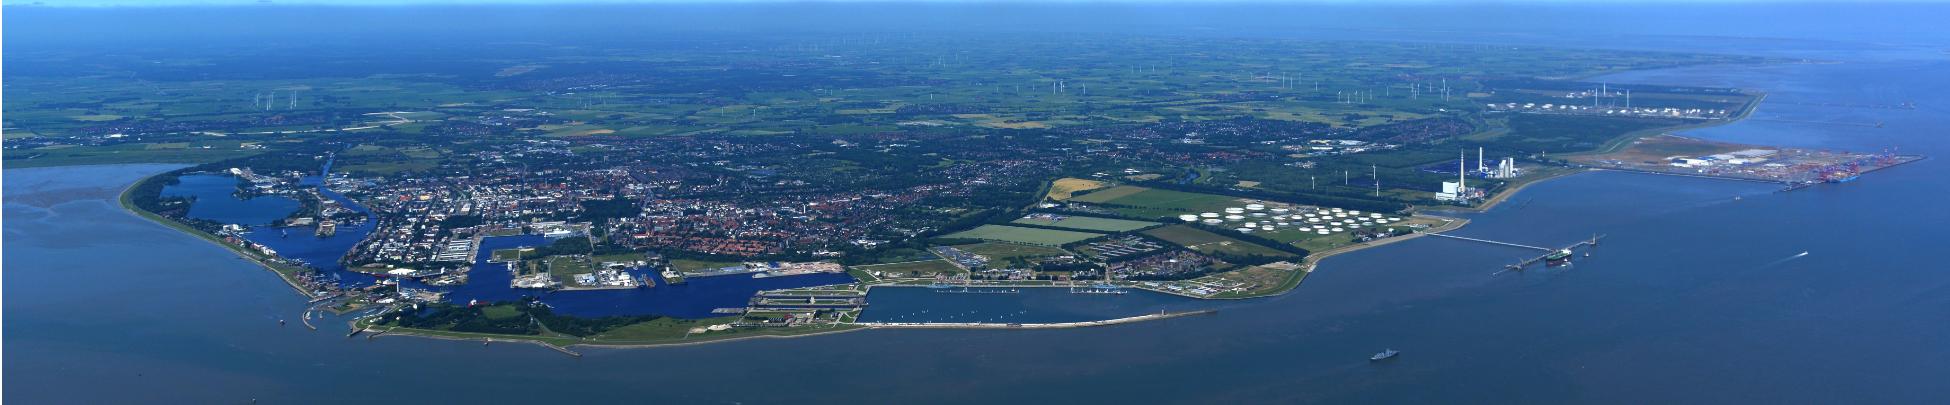 https://www.seaports.de/content/uploads/wilhelmshaven_banner.jpg